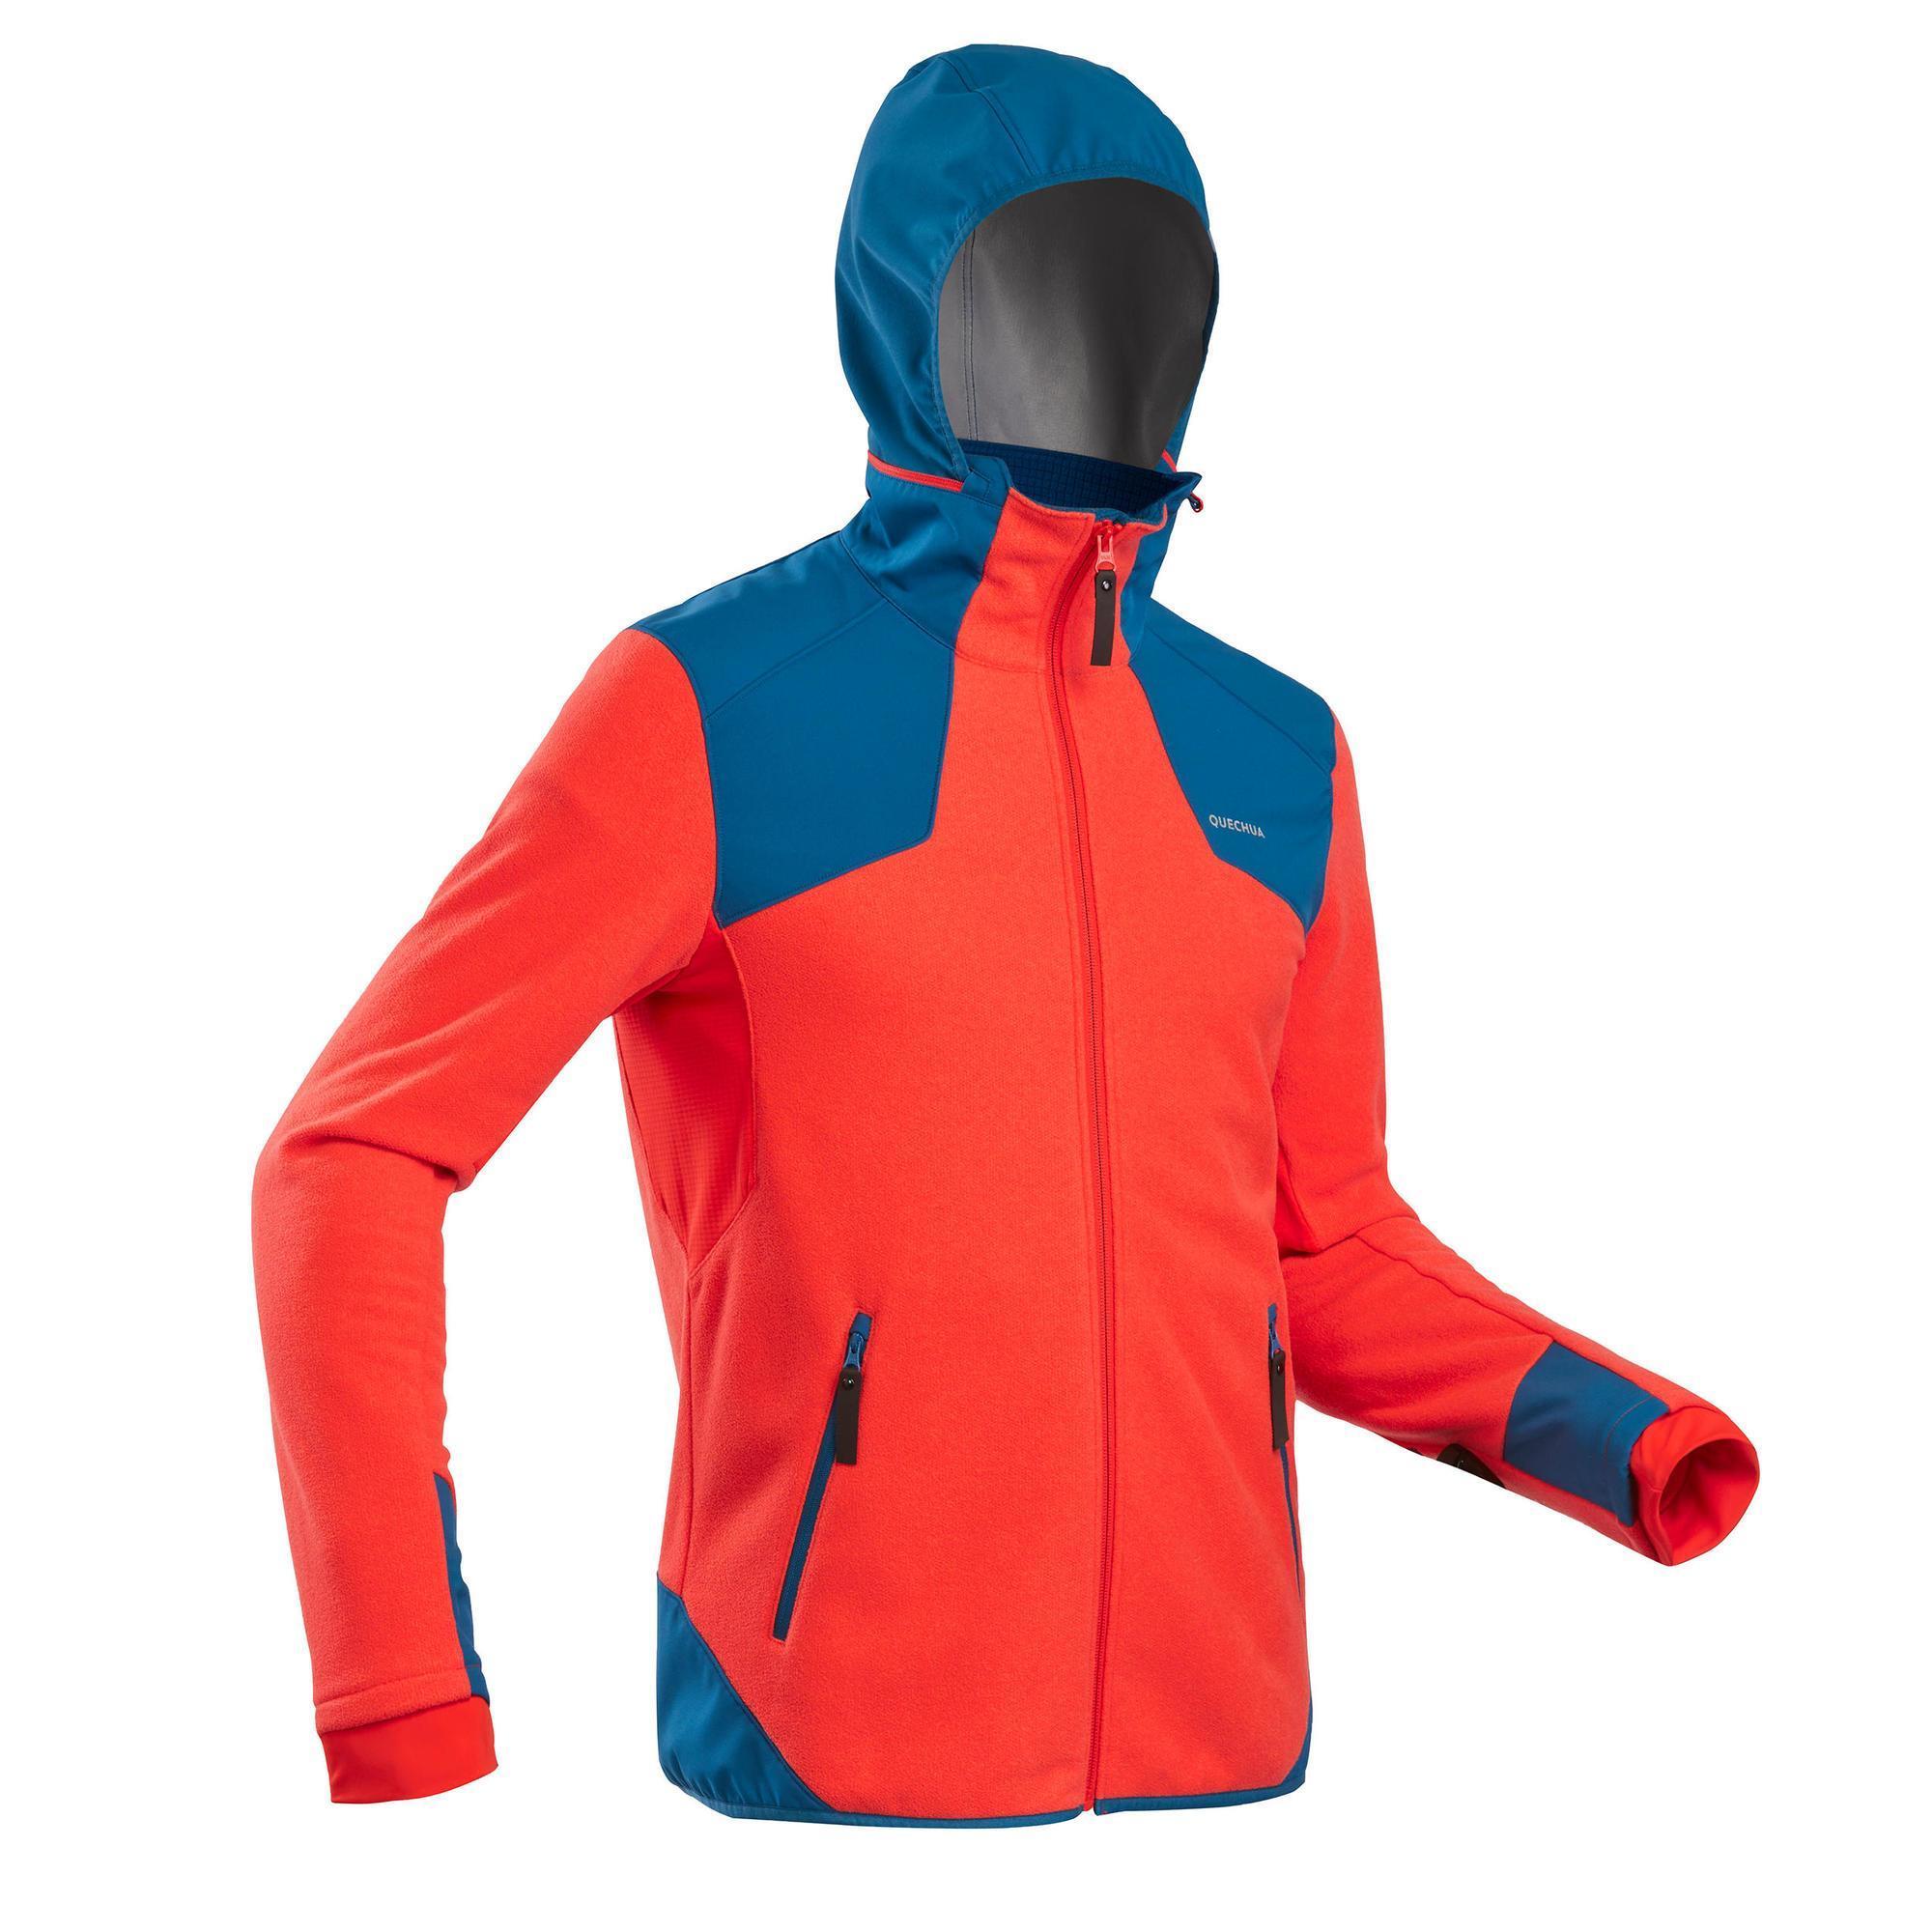 Winterjacke Winterwandern SH500 Extra Warm Herren